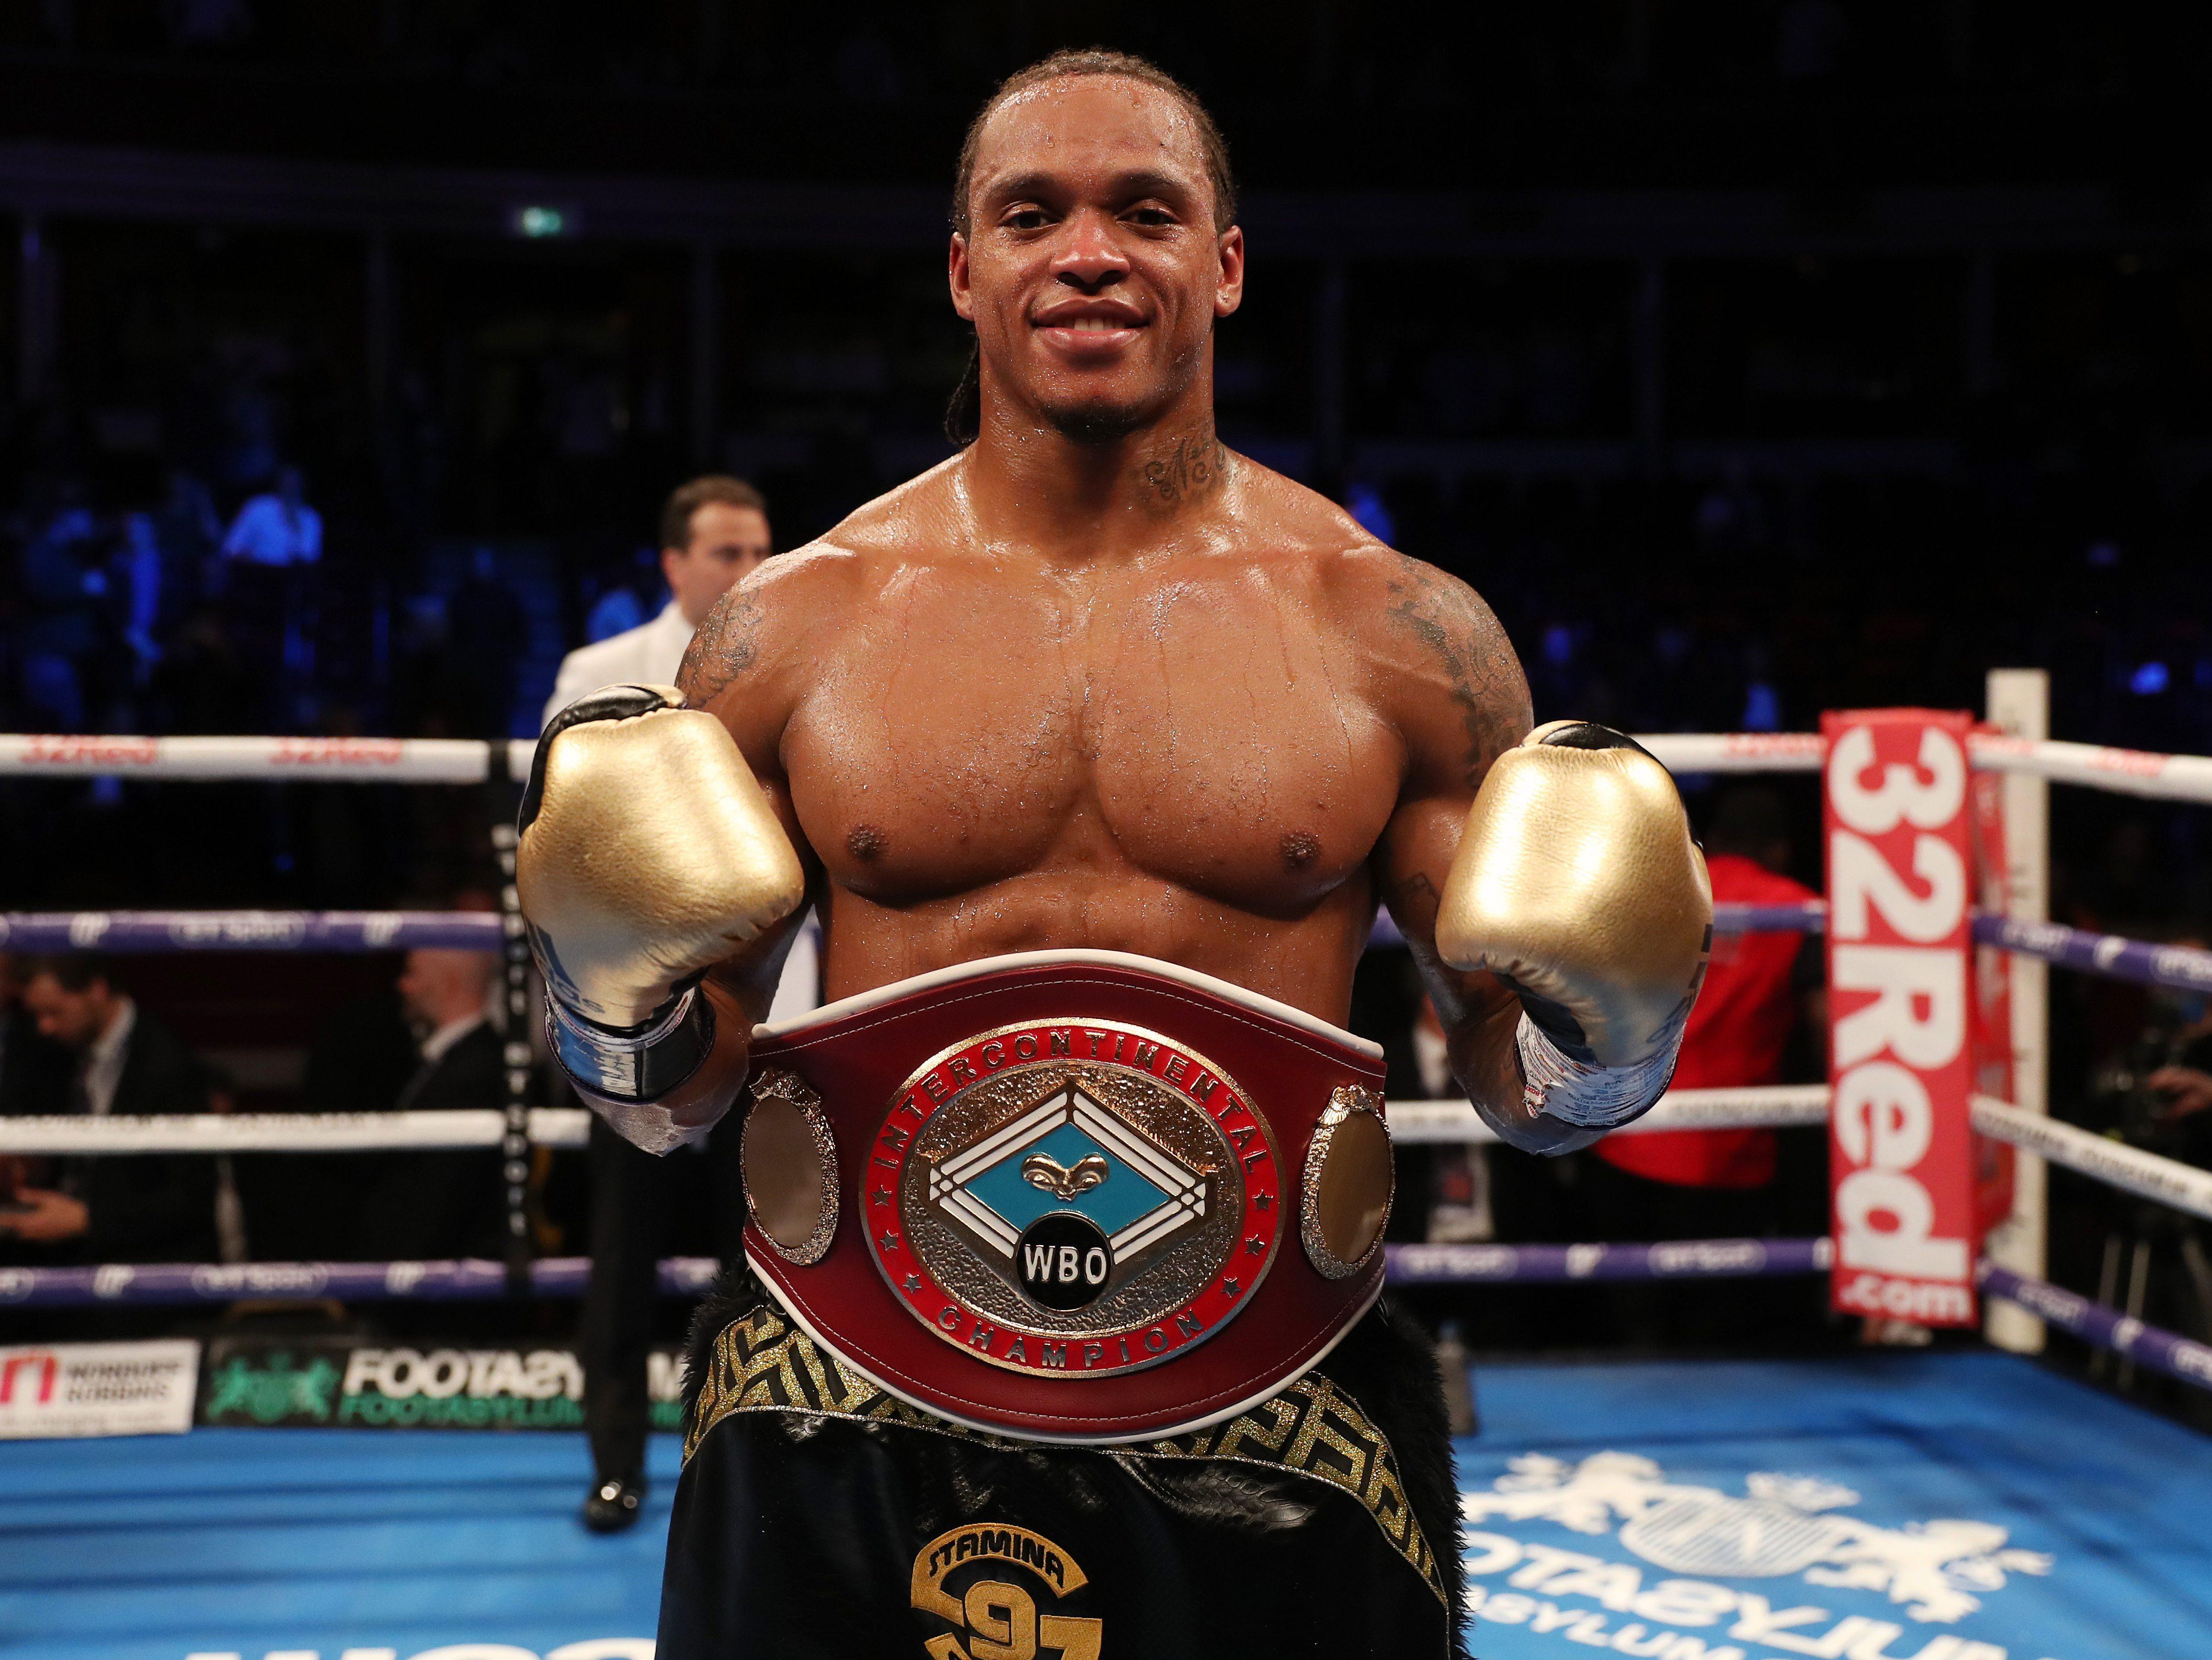 Anthony Yarde is set to challenge WBO light-heavyweight world champion Sergey Kovalev in Russia